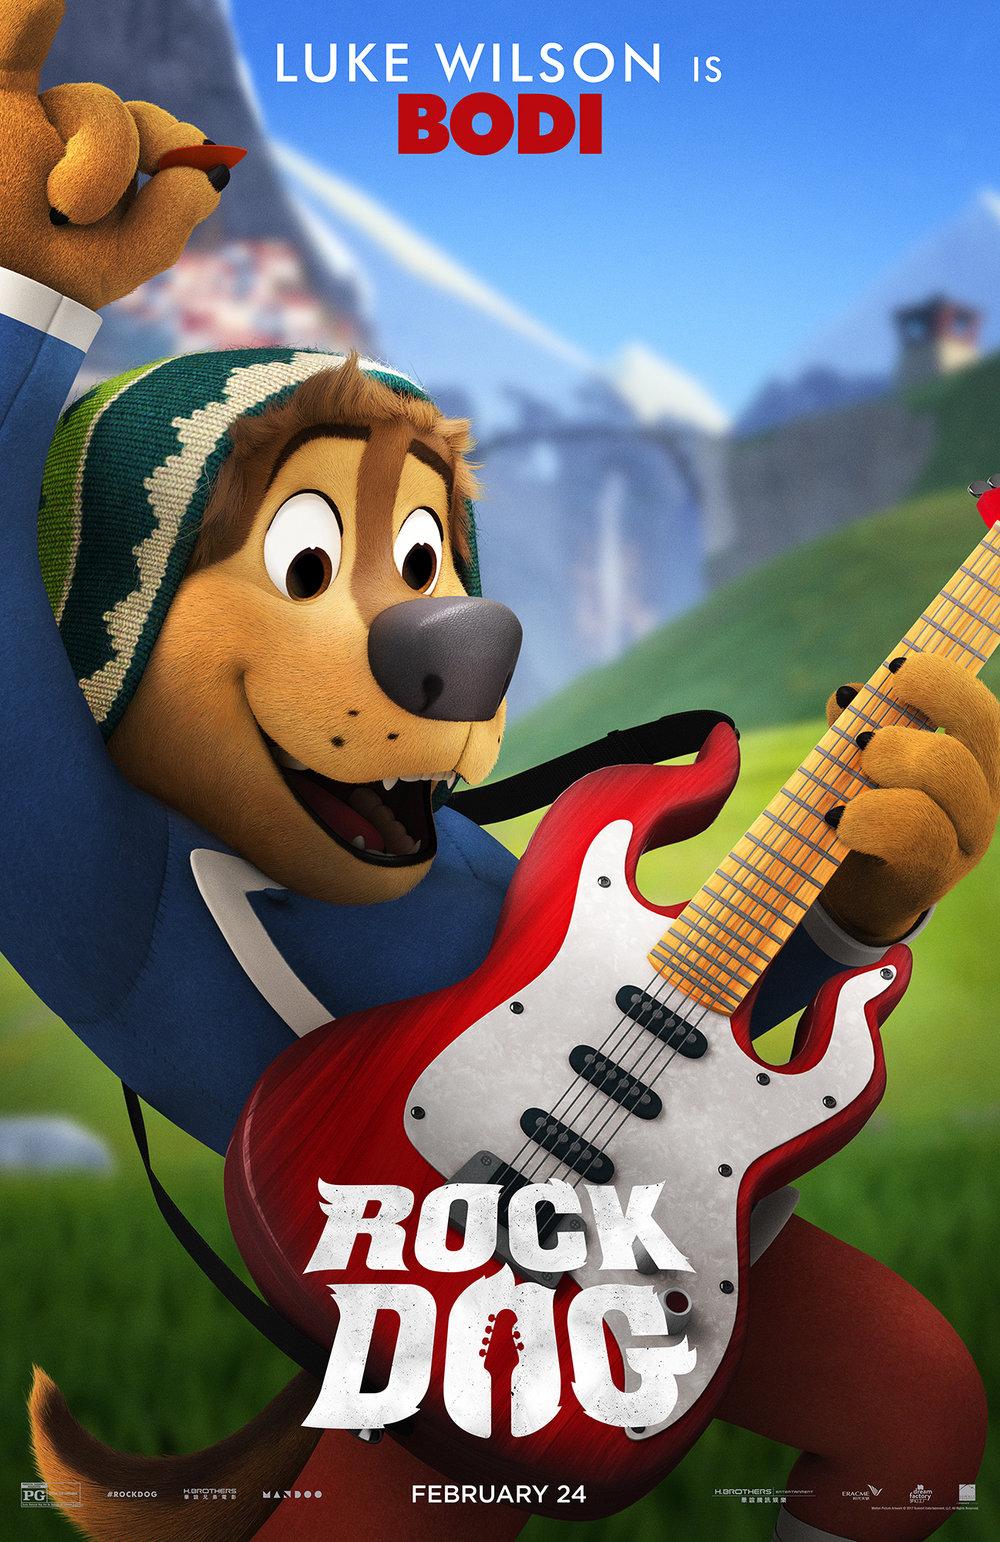 RockDog_1Sht_Bodi_VF_100dpi.jpg